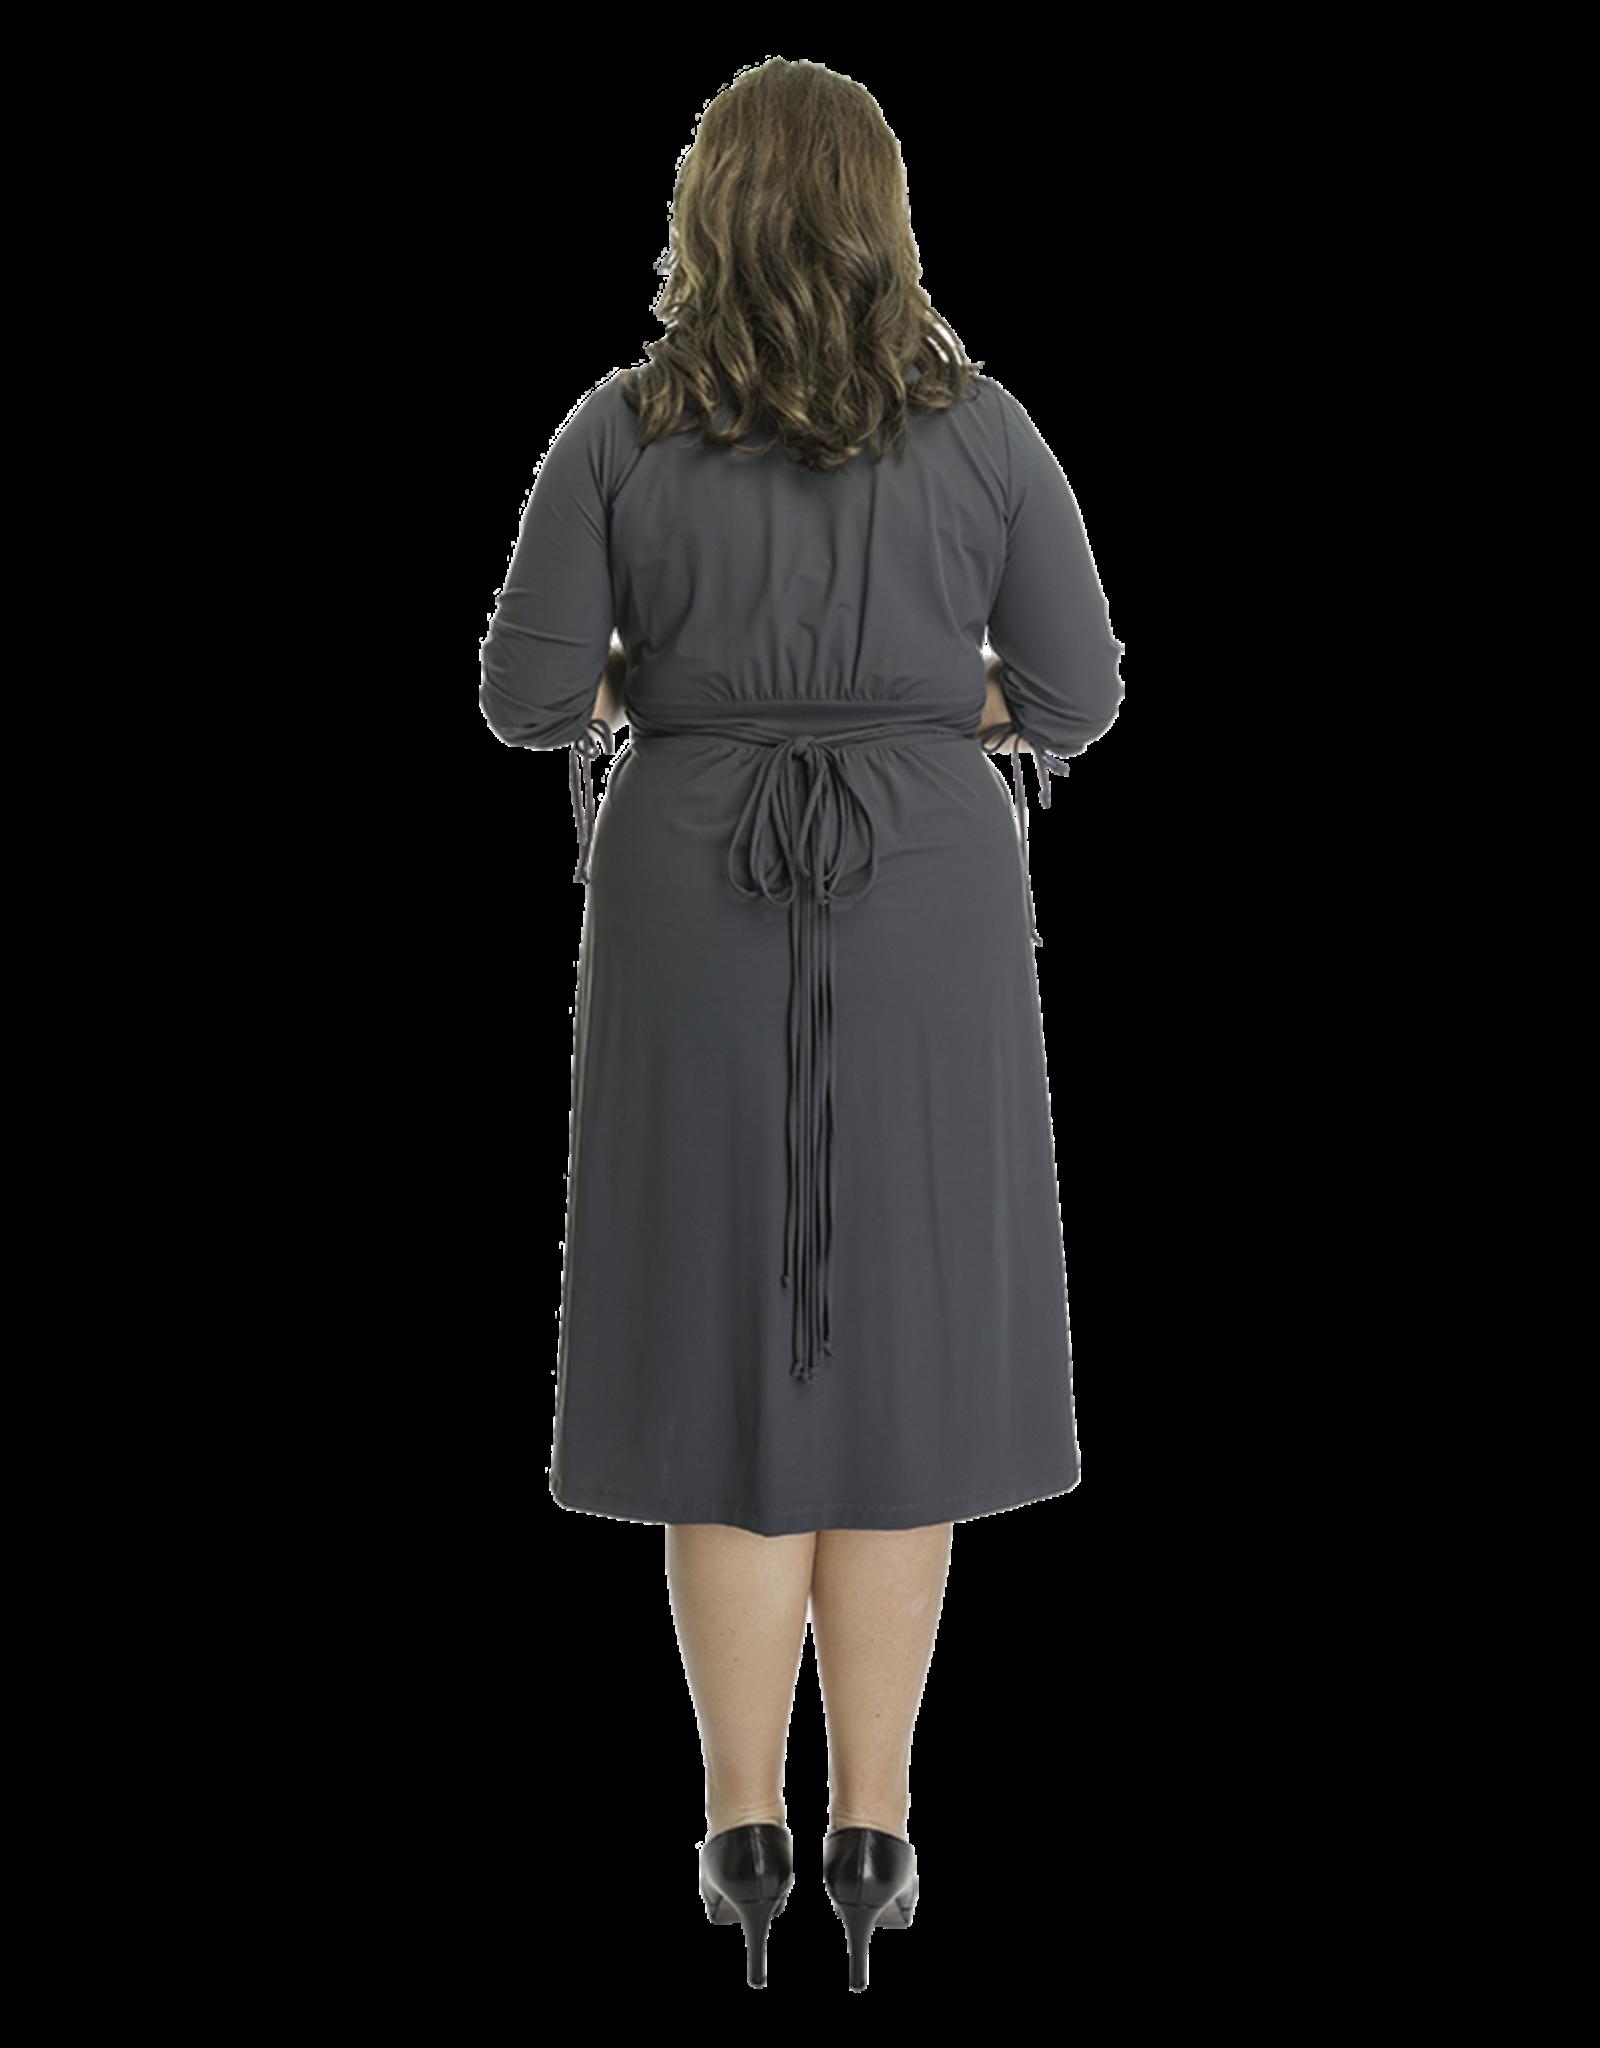 Lovely Dress Jurk Sonja Grigio Scuro